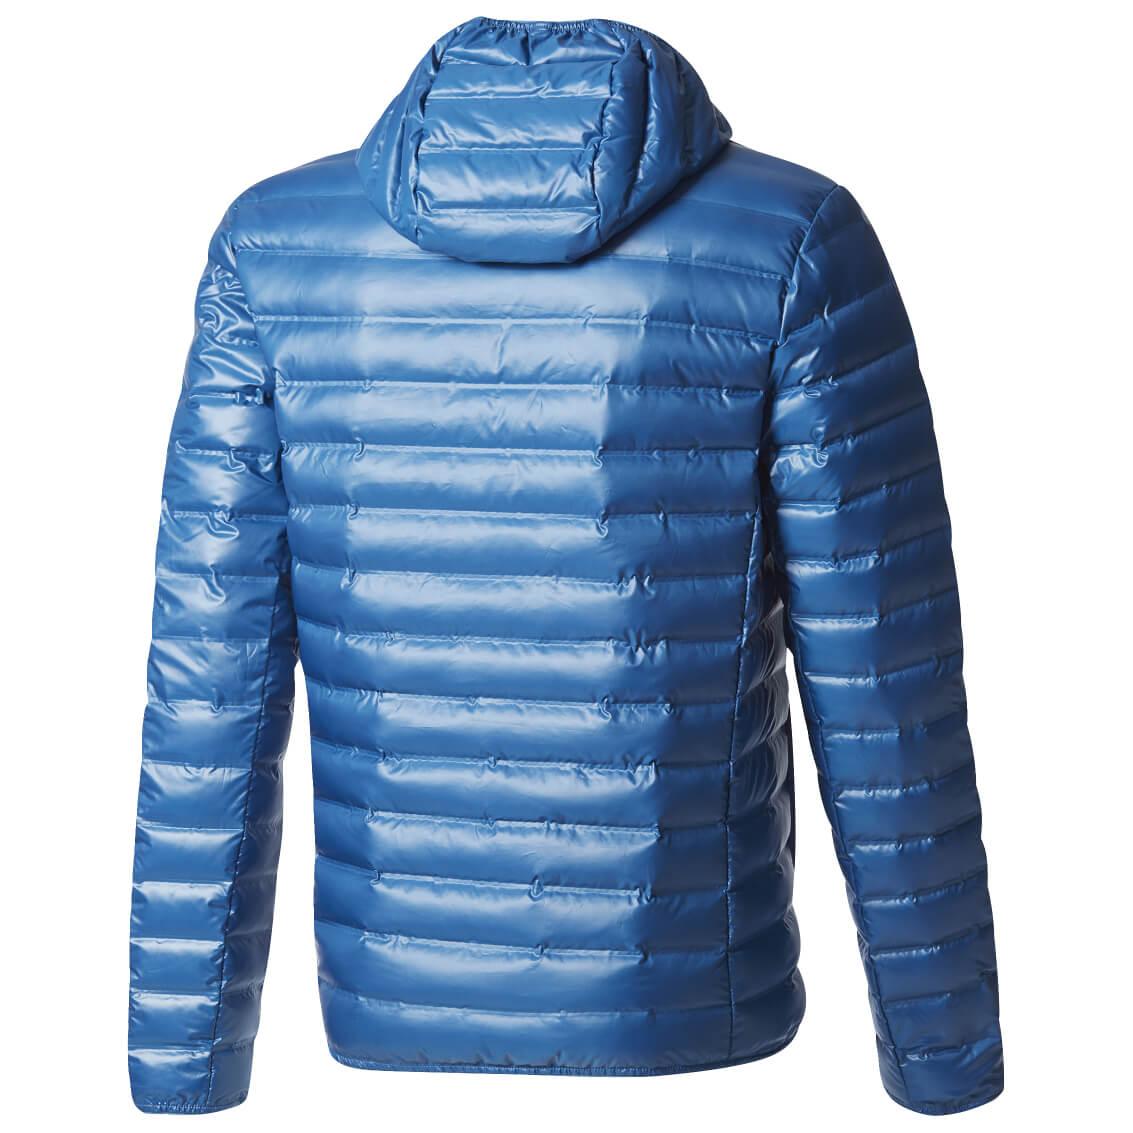 Adidas Terrex Lite Down Hooded Jacket Doudoune Homme